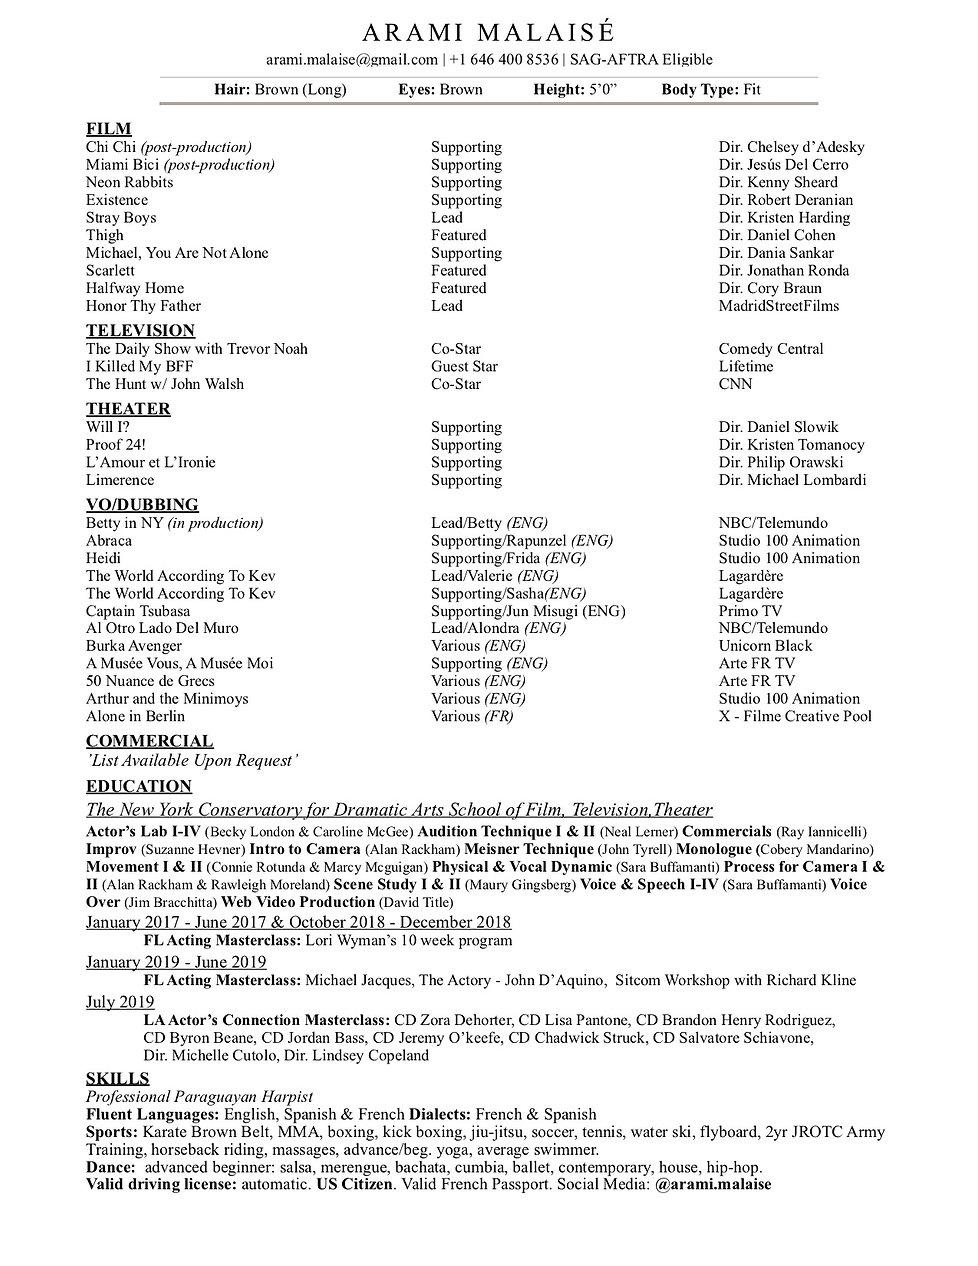 PDF_-_Arami_Malaise_Résumé_(Acting).jpg